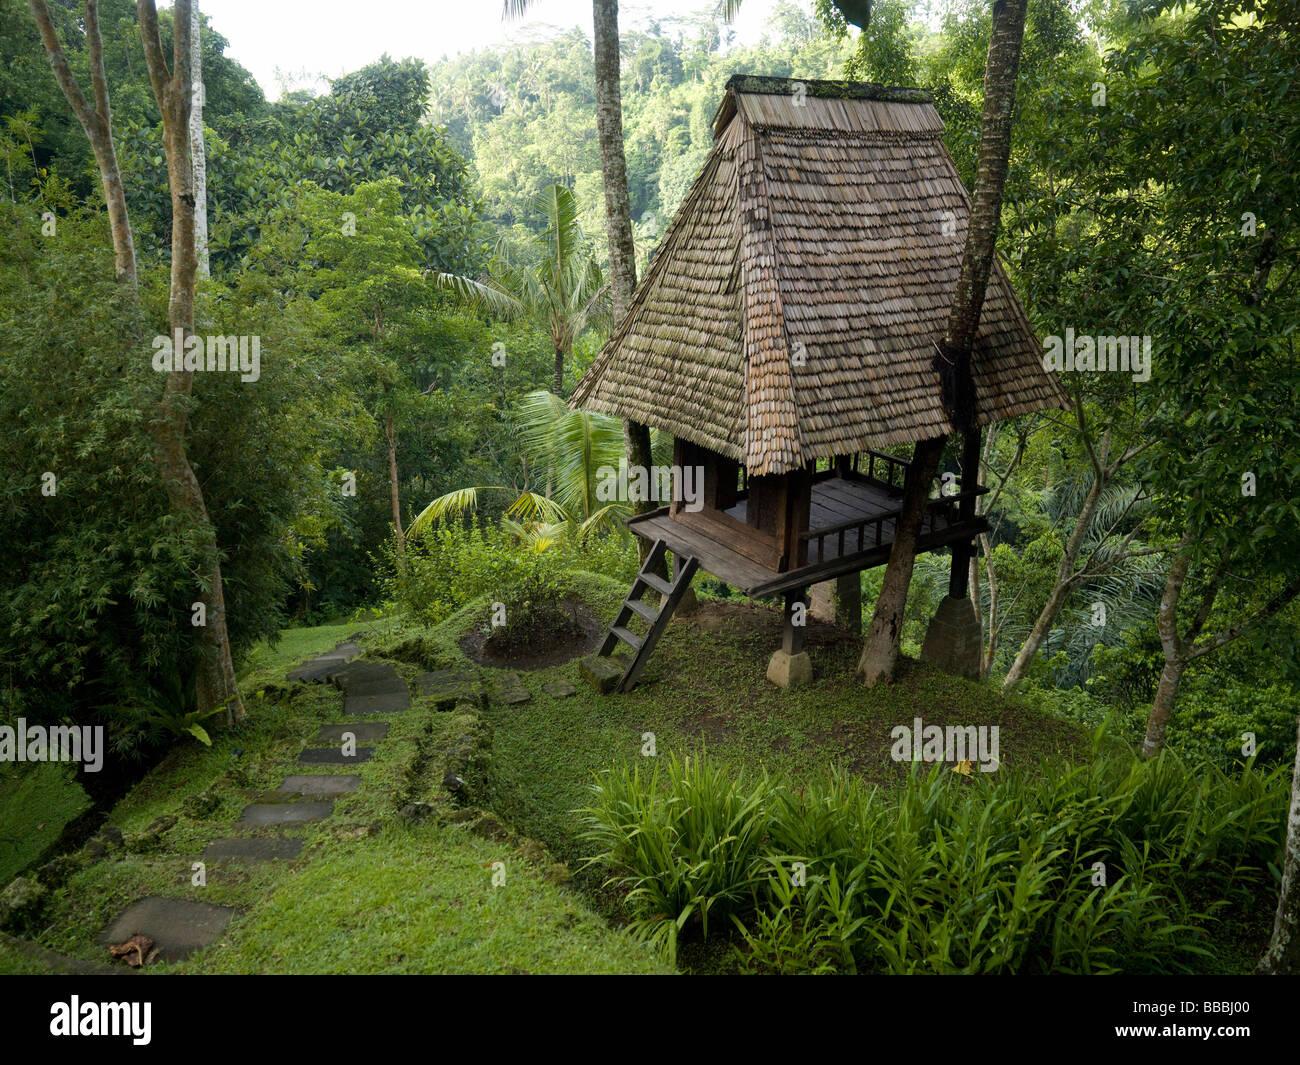 cabane en bois dans la for t banque d 39 images photo stock 24227168 alamy. Black Bedroom Furniture Sets. Home Design Ideas